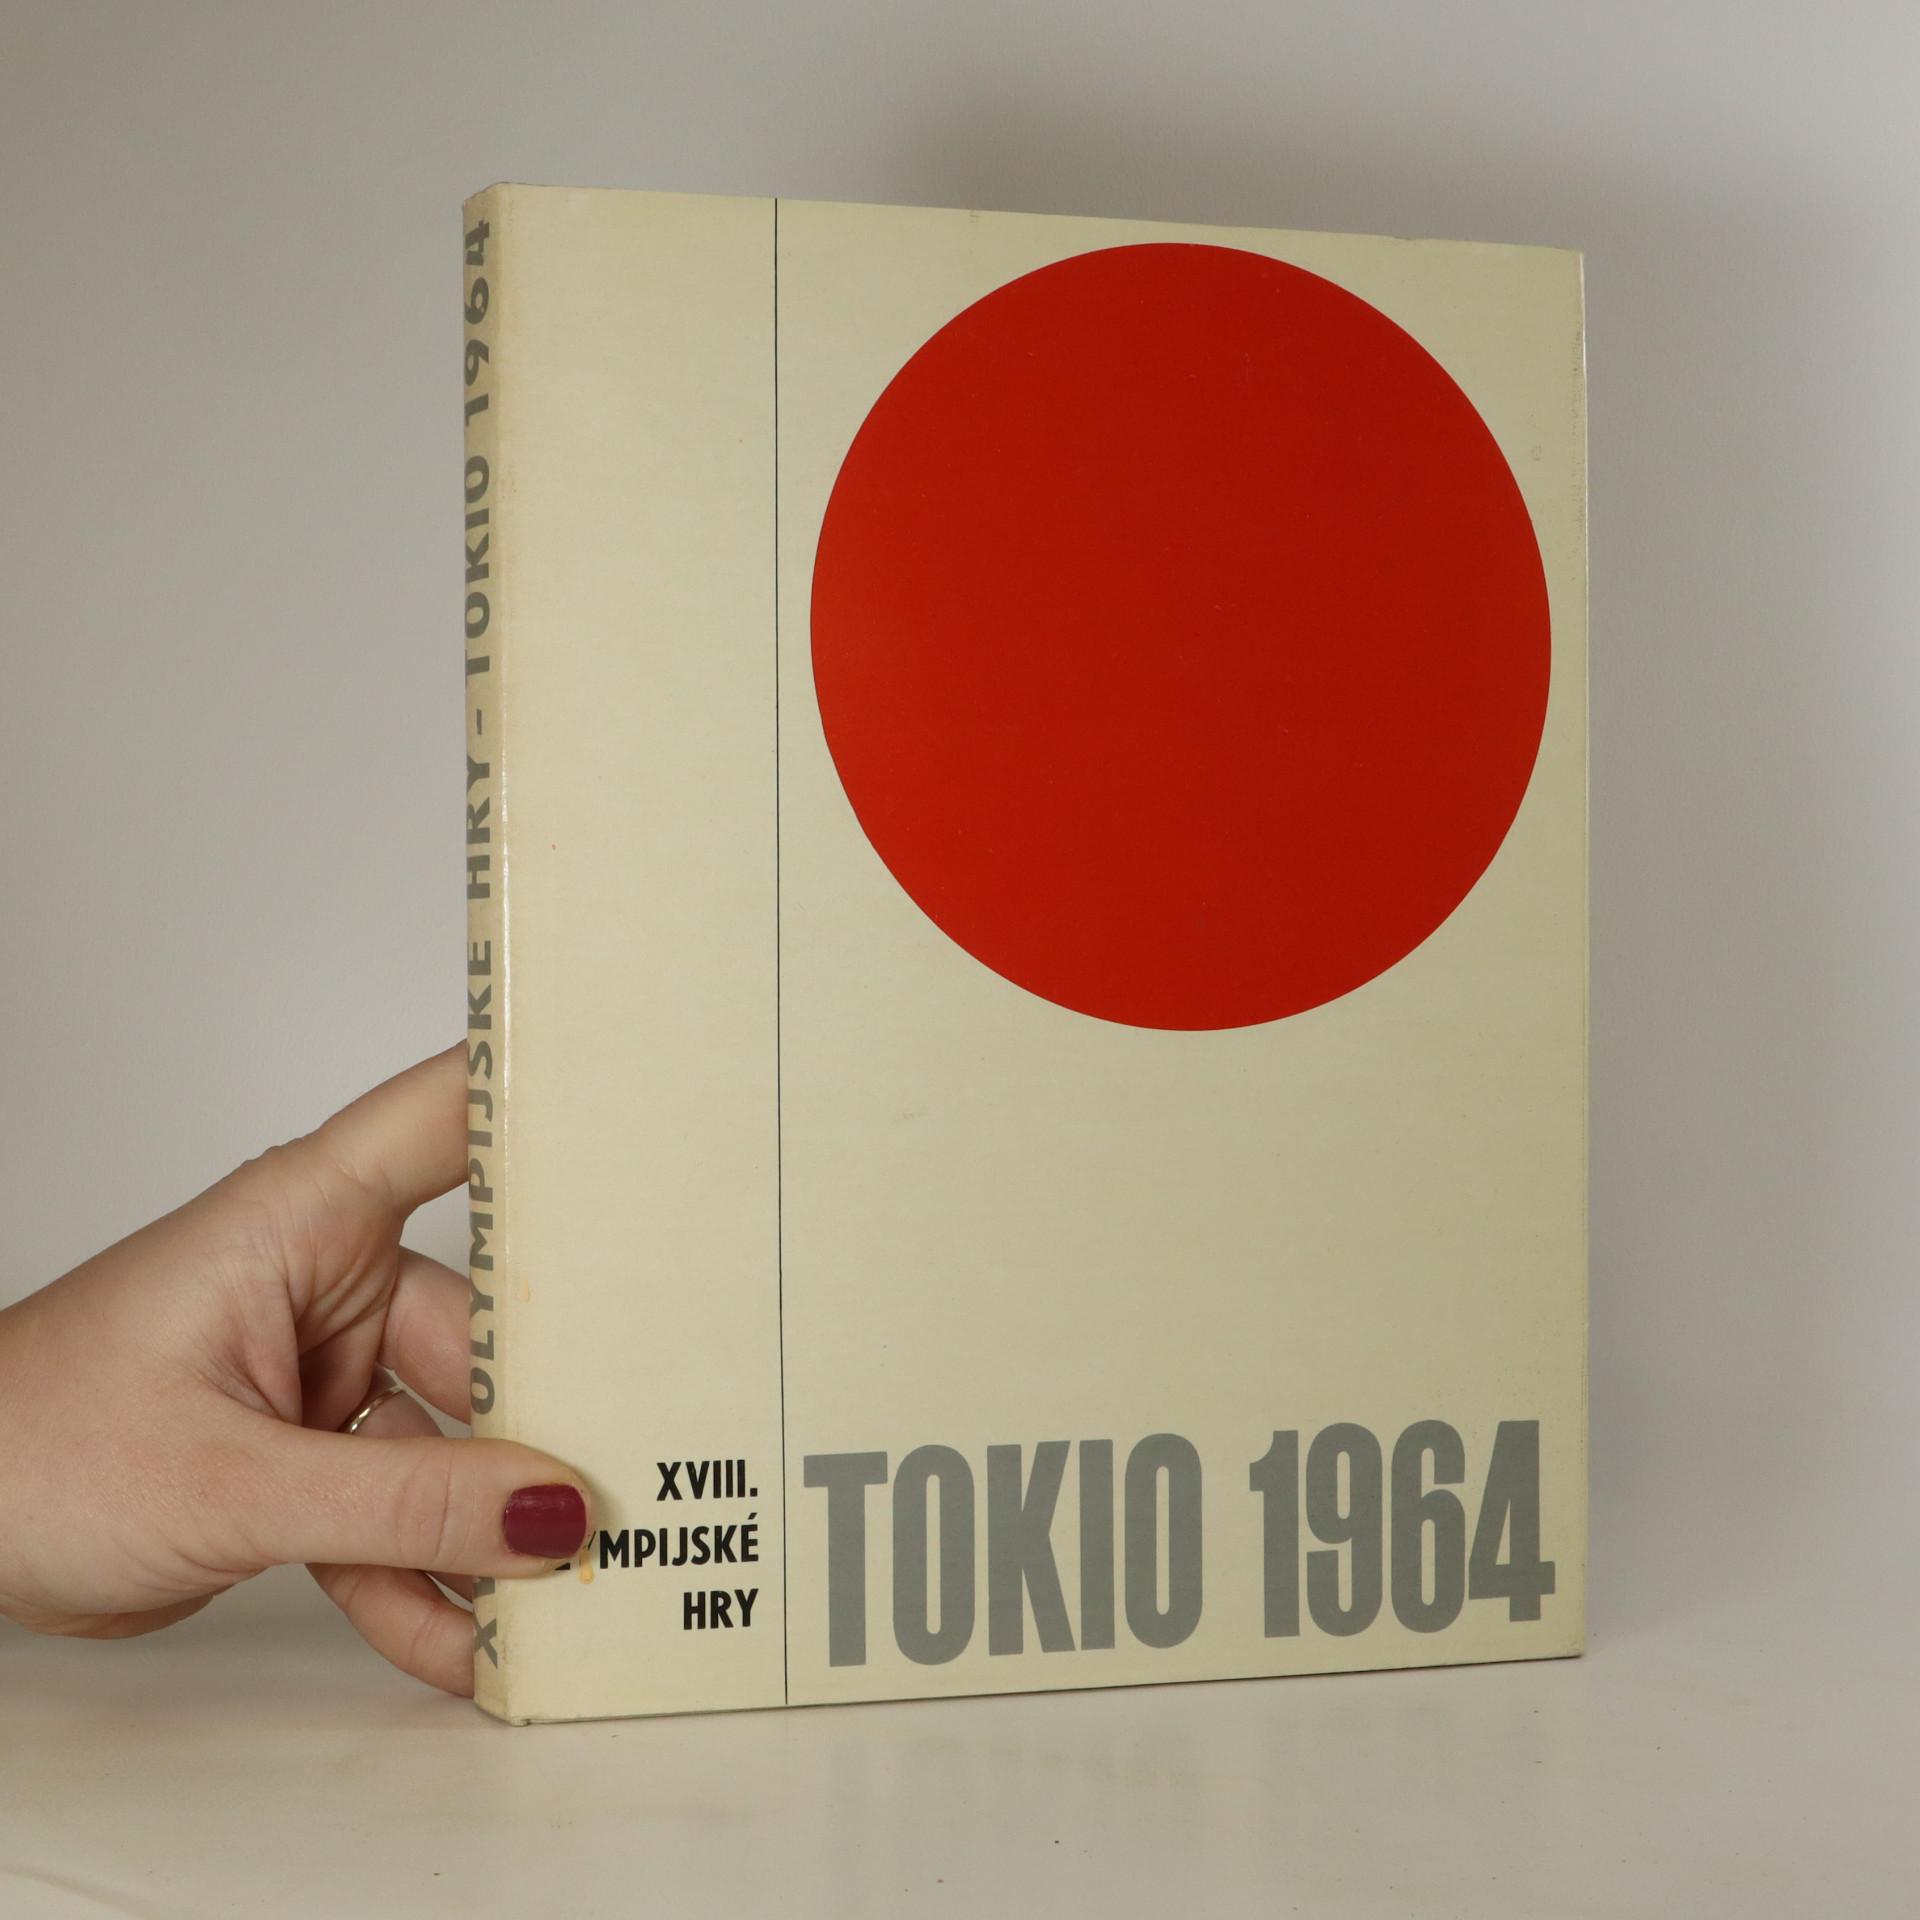 antikvární kniha Tokio 1964. XVIII. olympijské hry, 1965